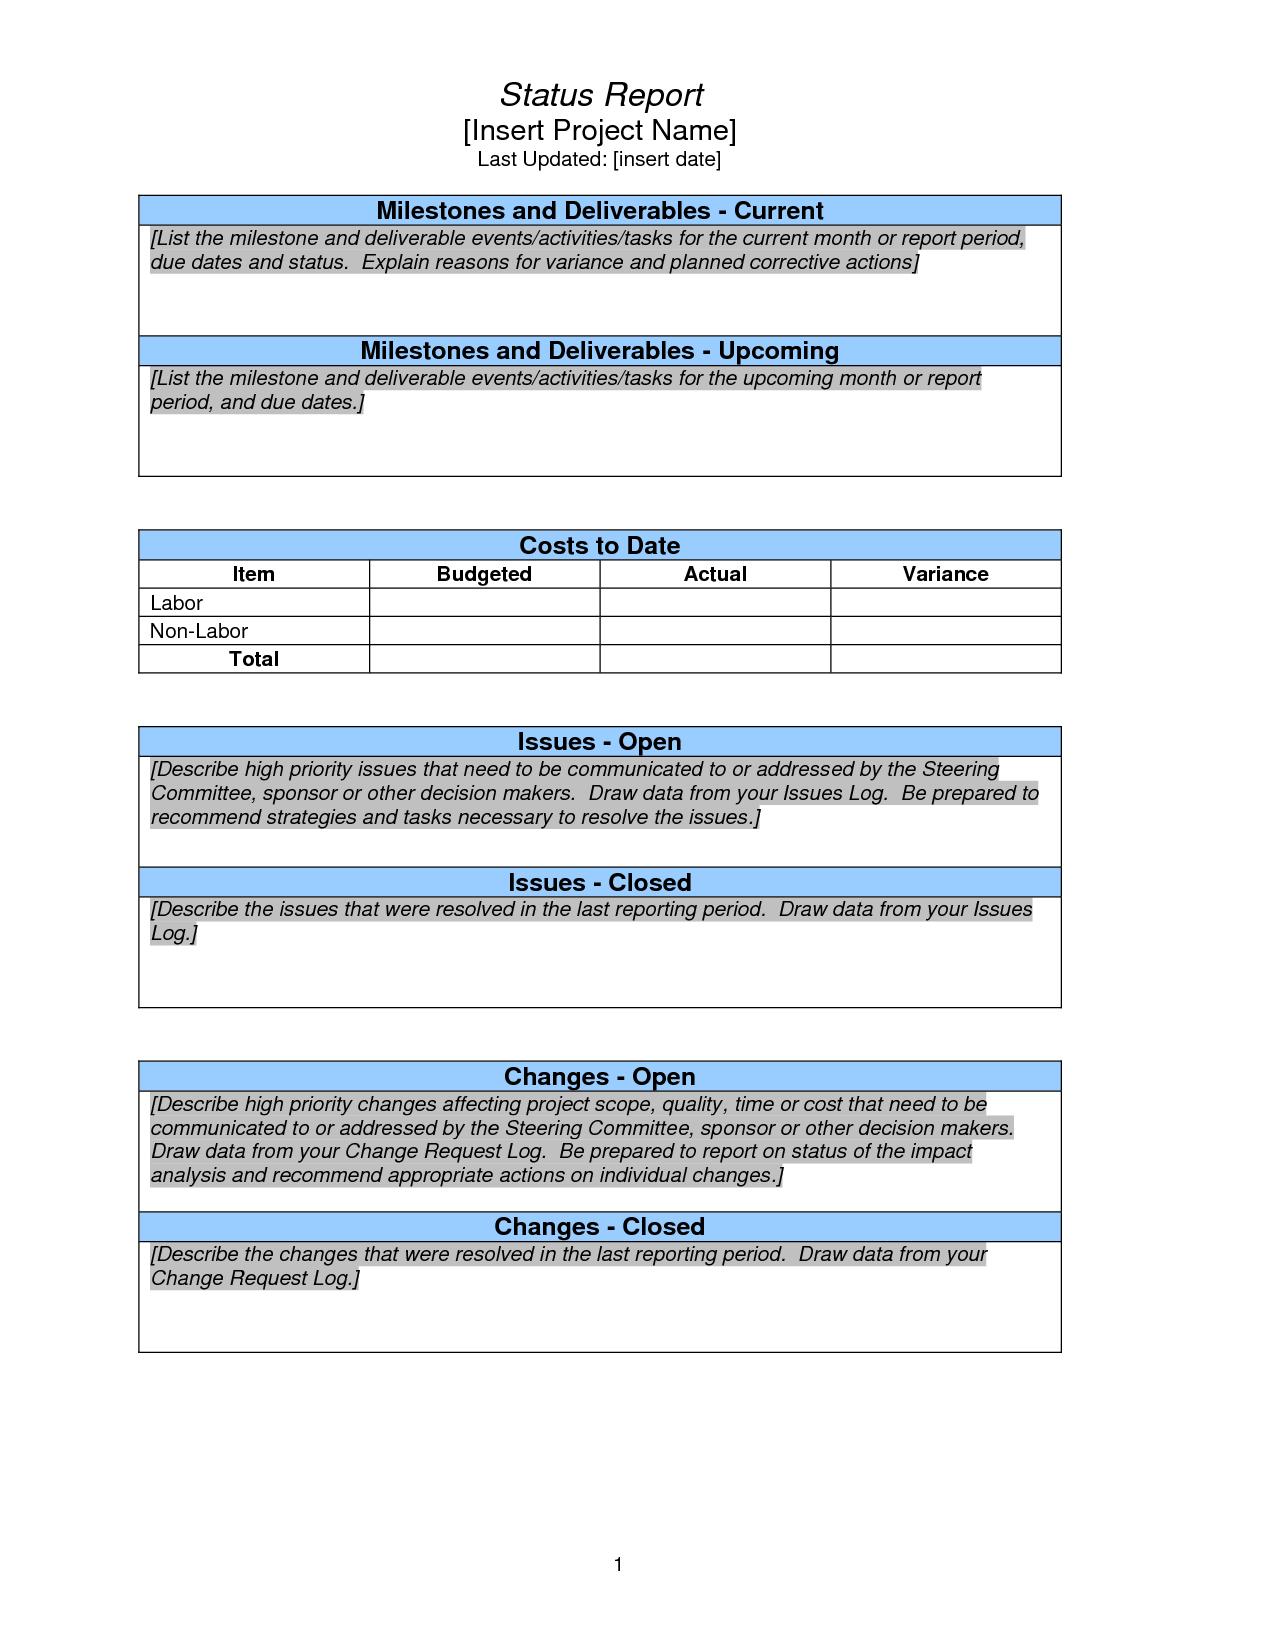 Project Status Report Sample